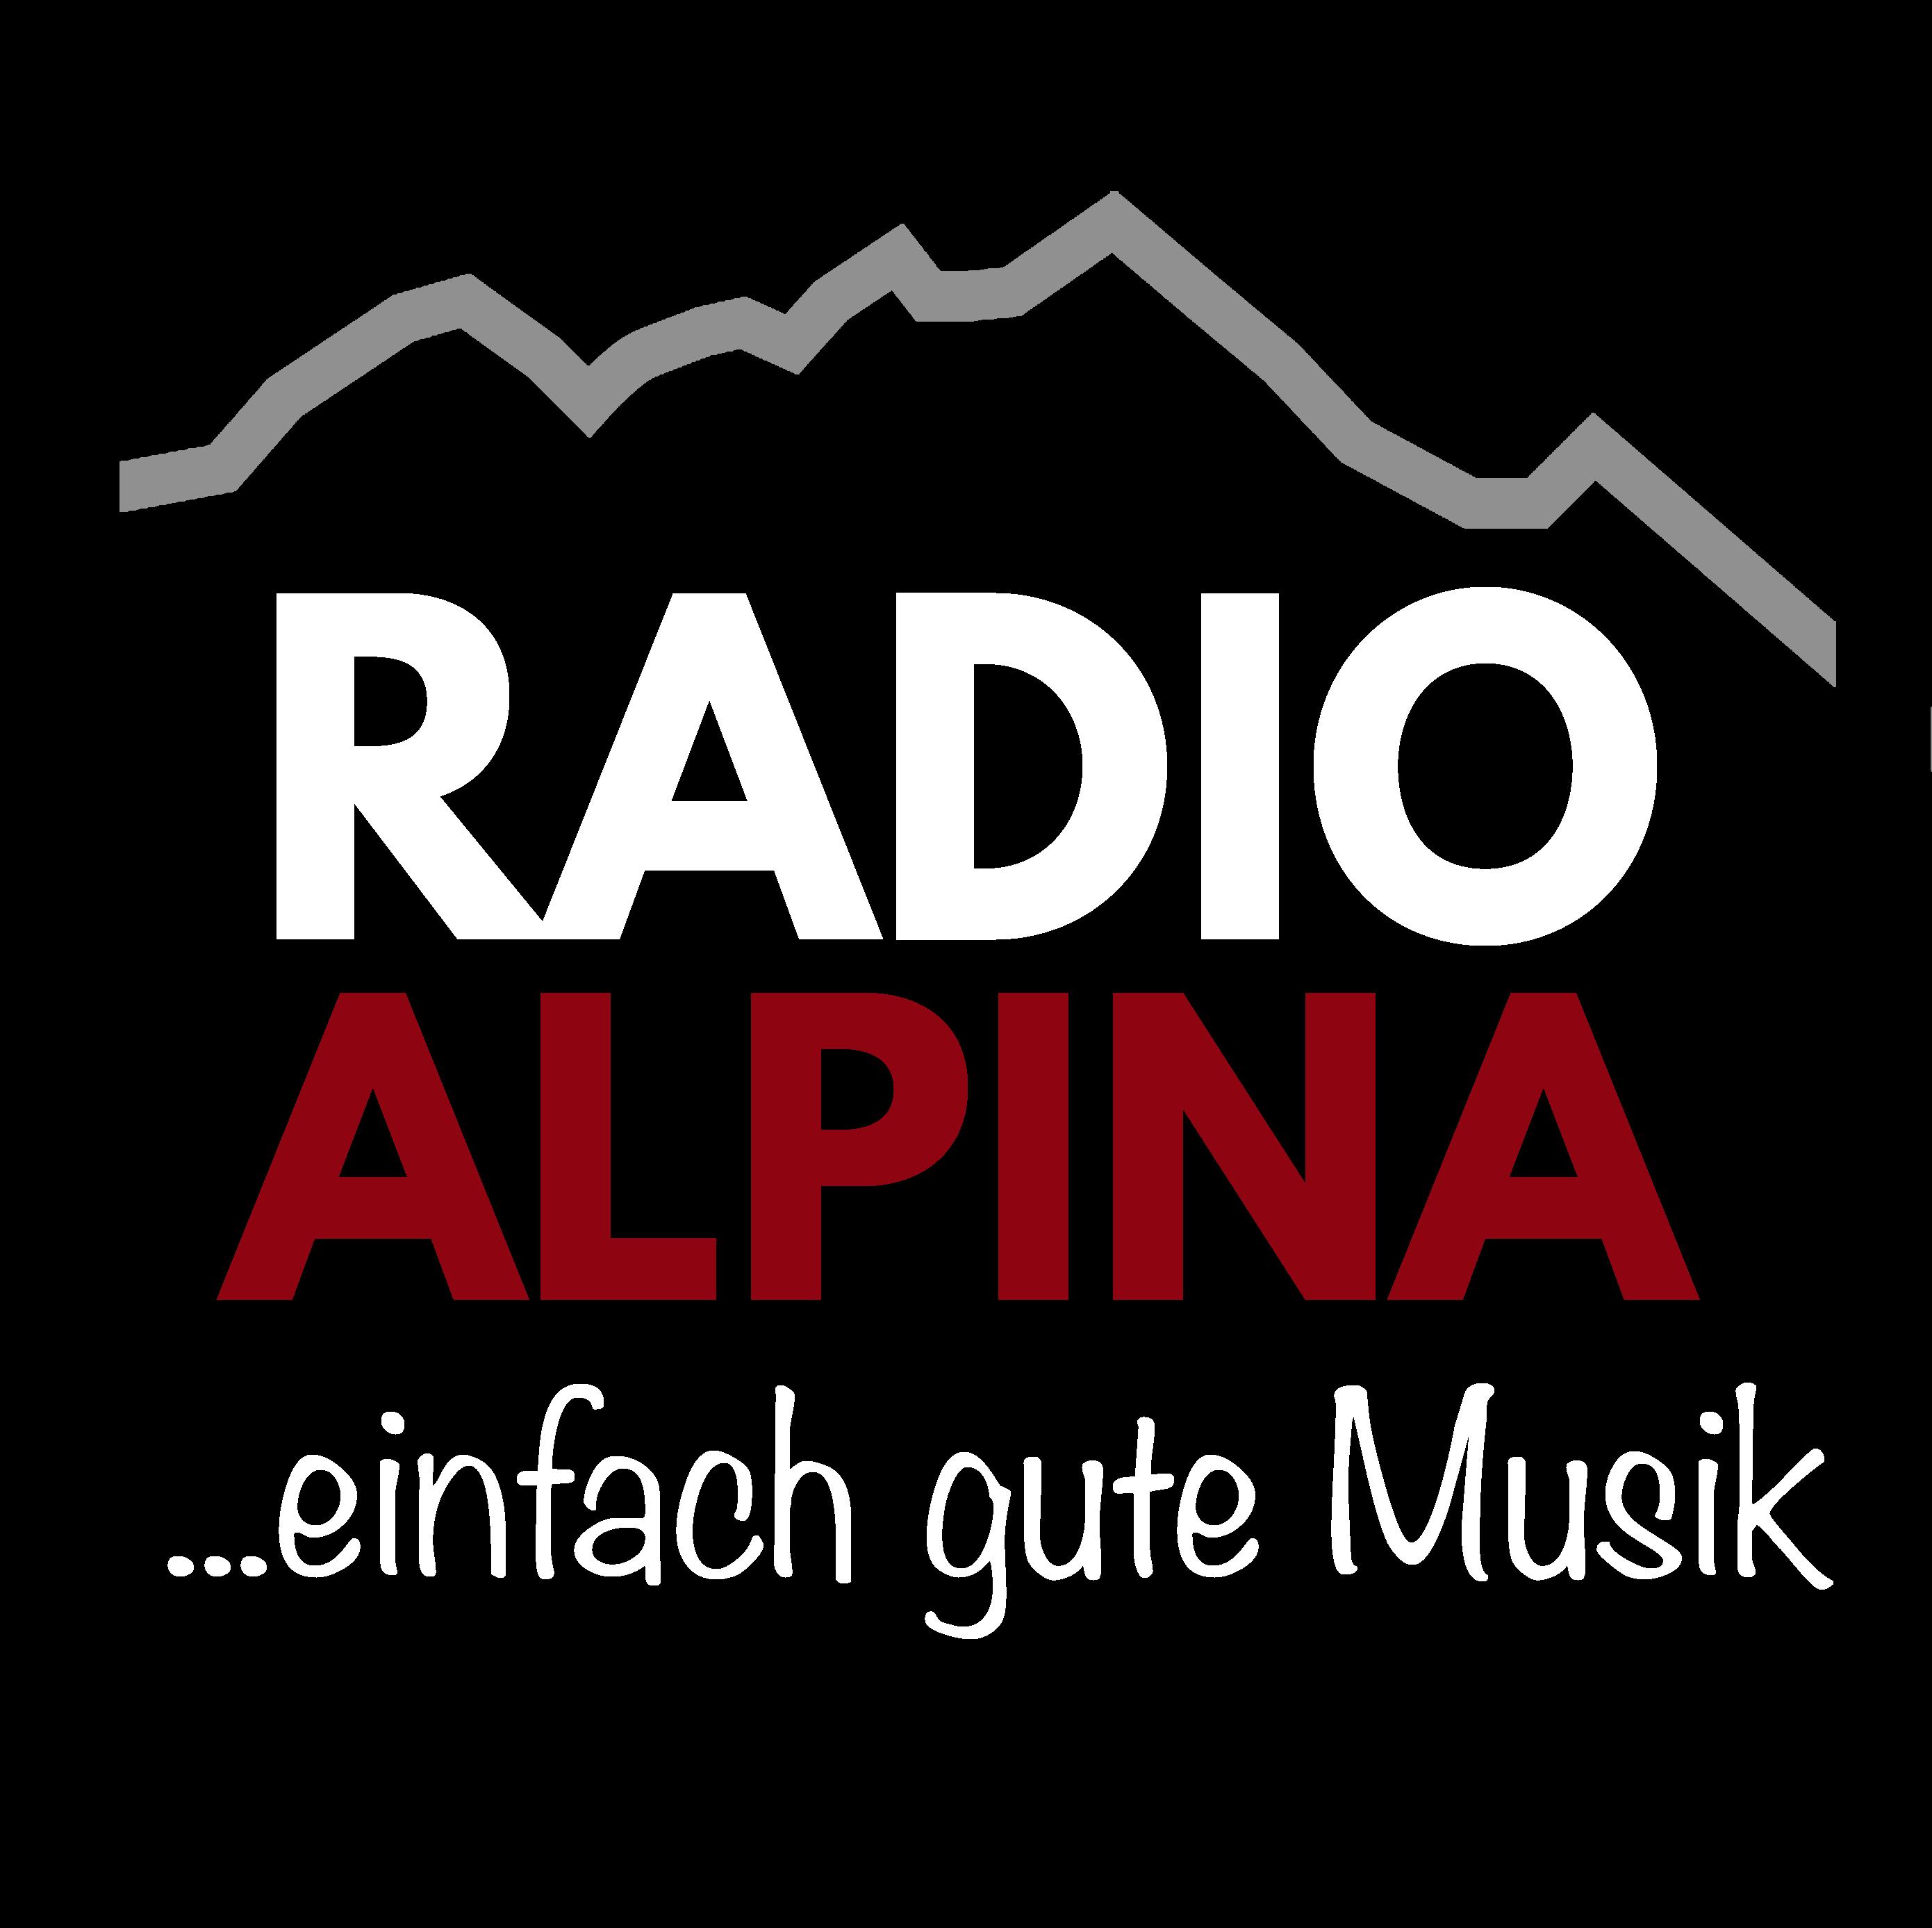 Radio Alpina